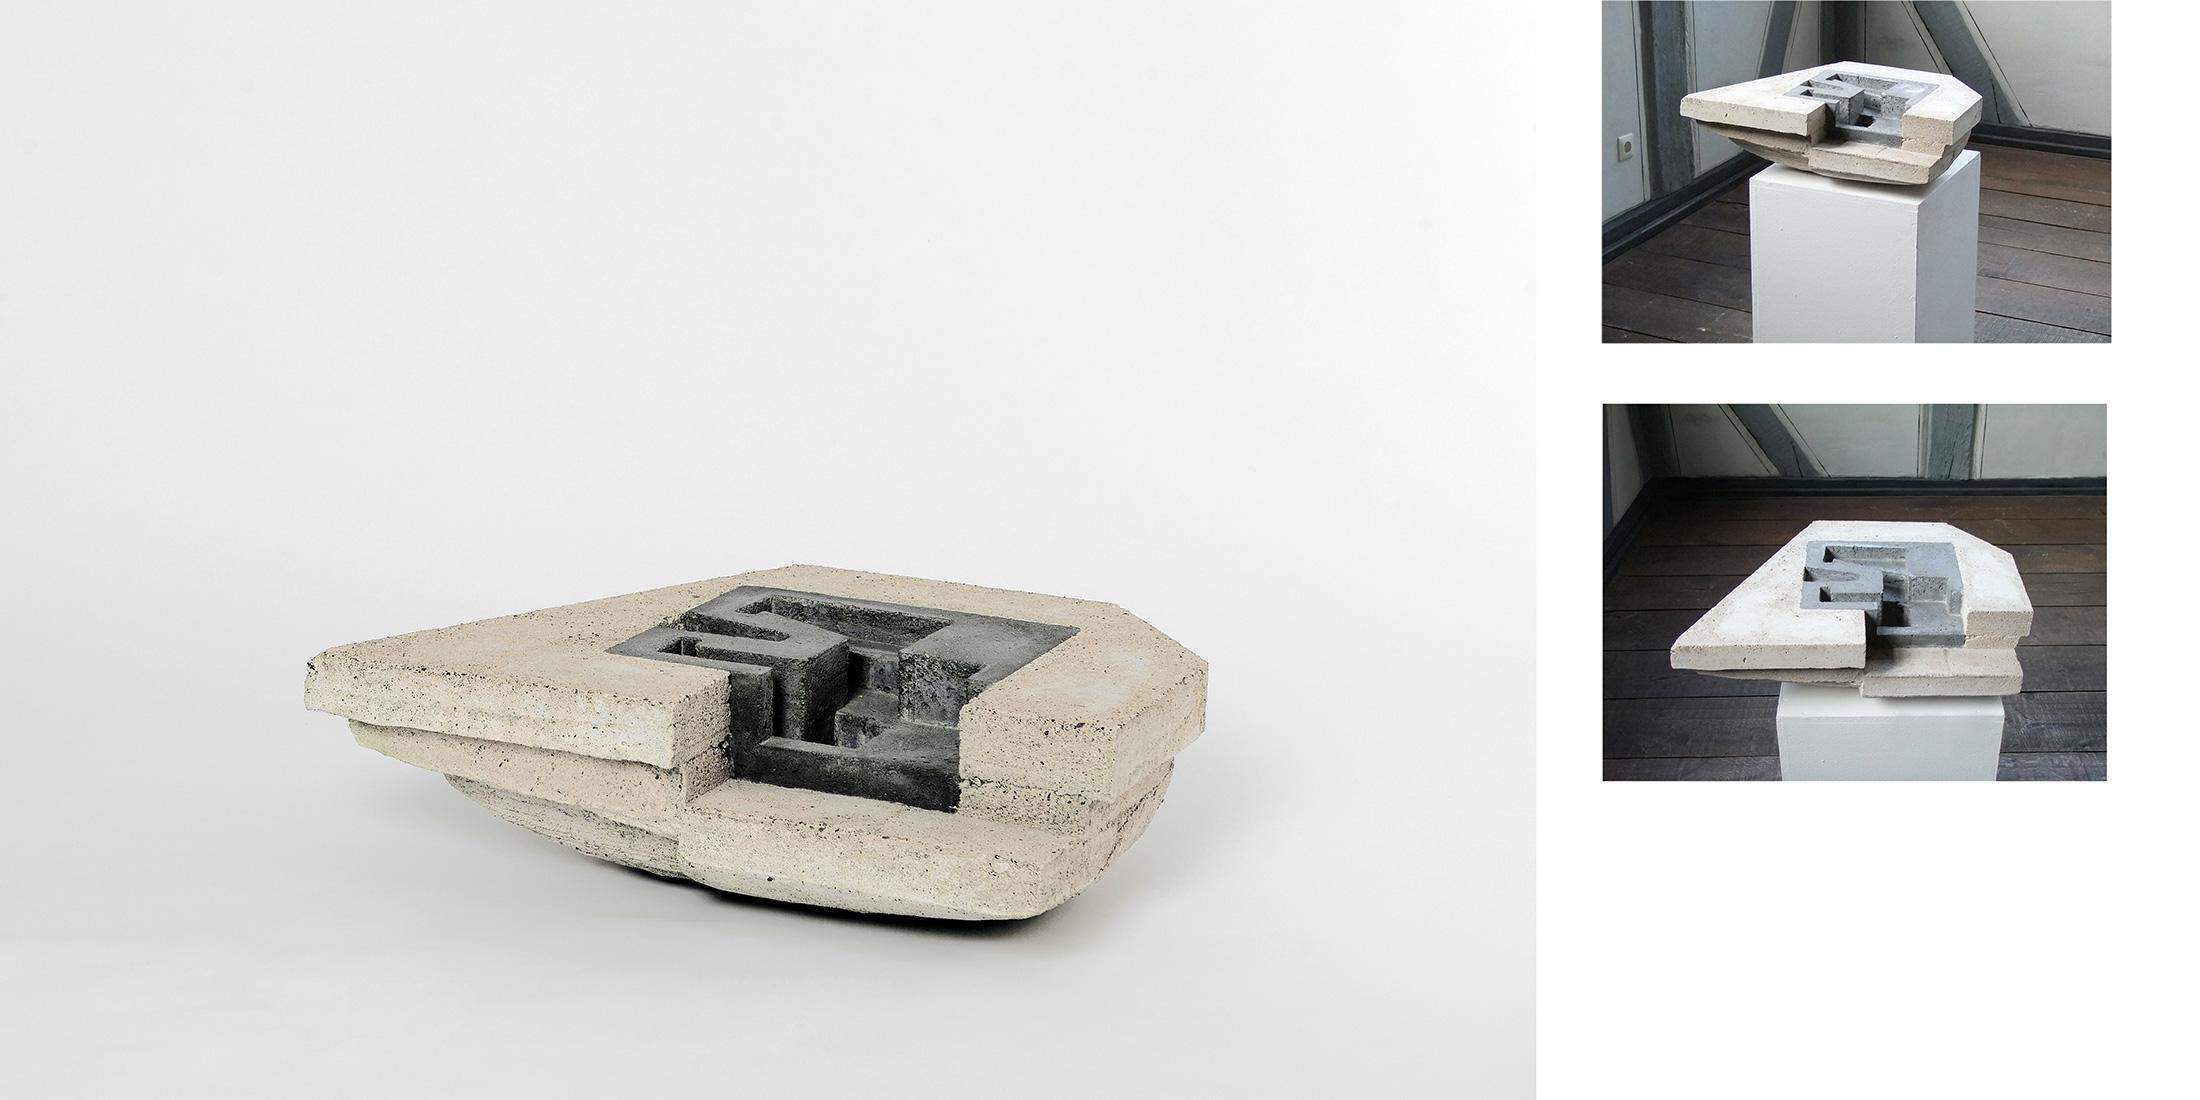 Espace|Surface 1 | 2009 | Steinzeug,Beton |  79 x 17 x 109 cm